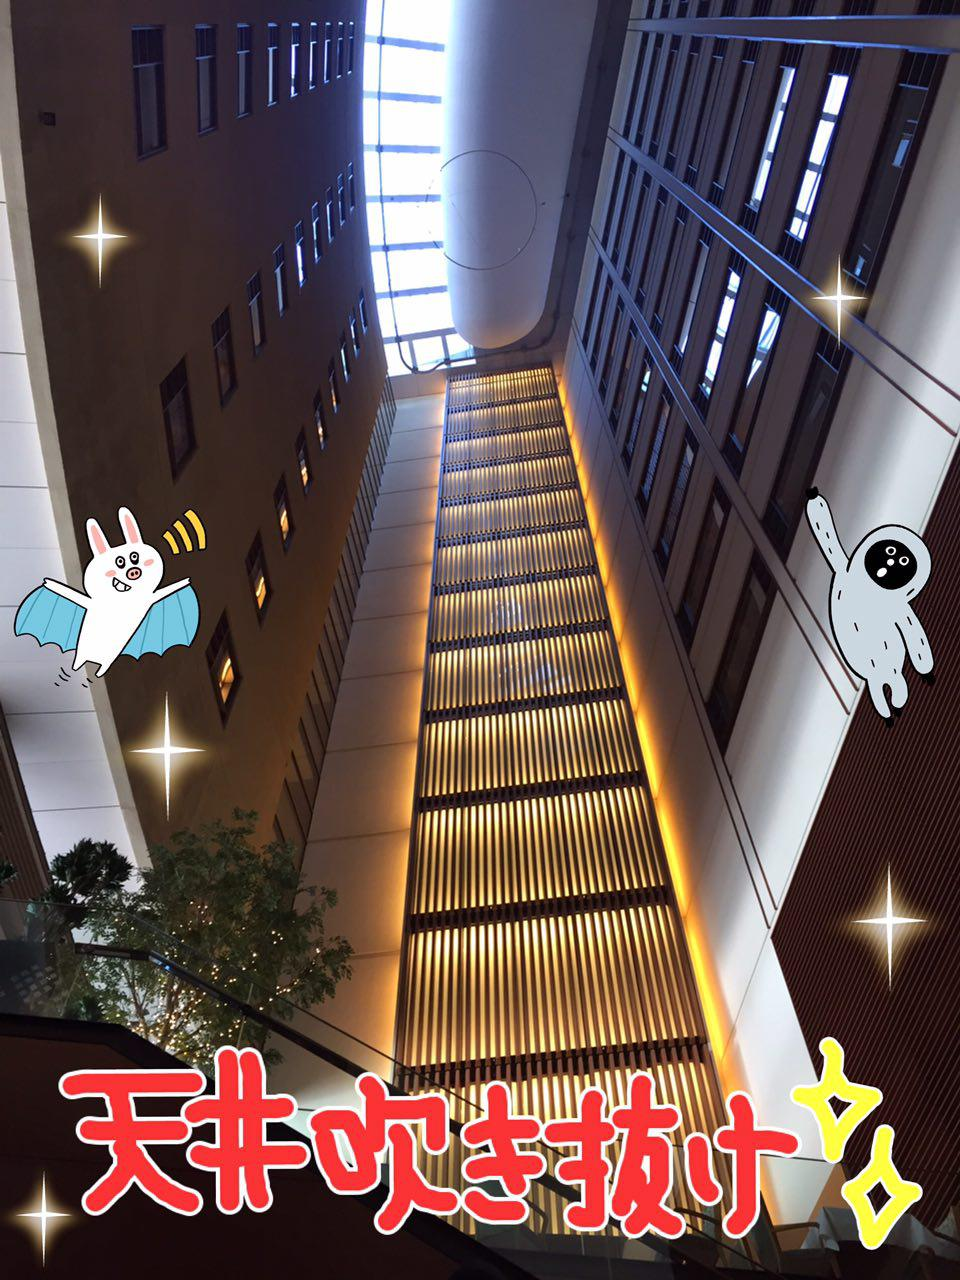 photo_2017-02-15_23-49-30.jpg